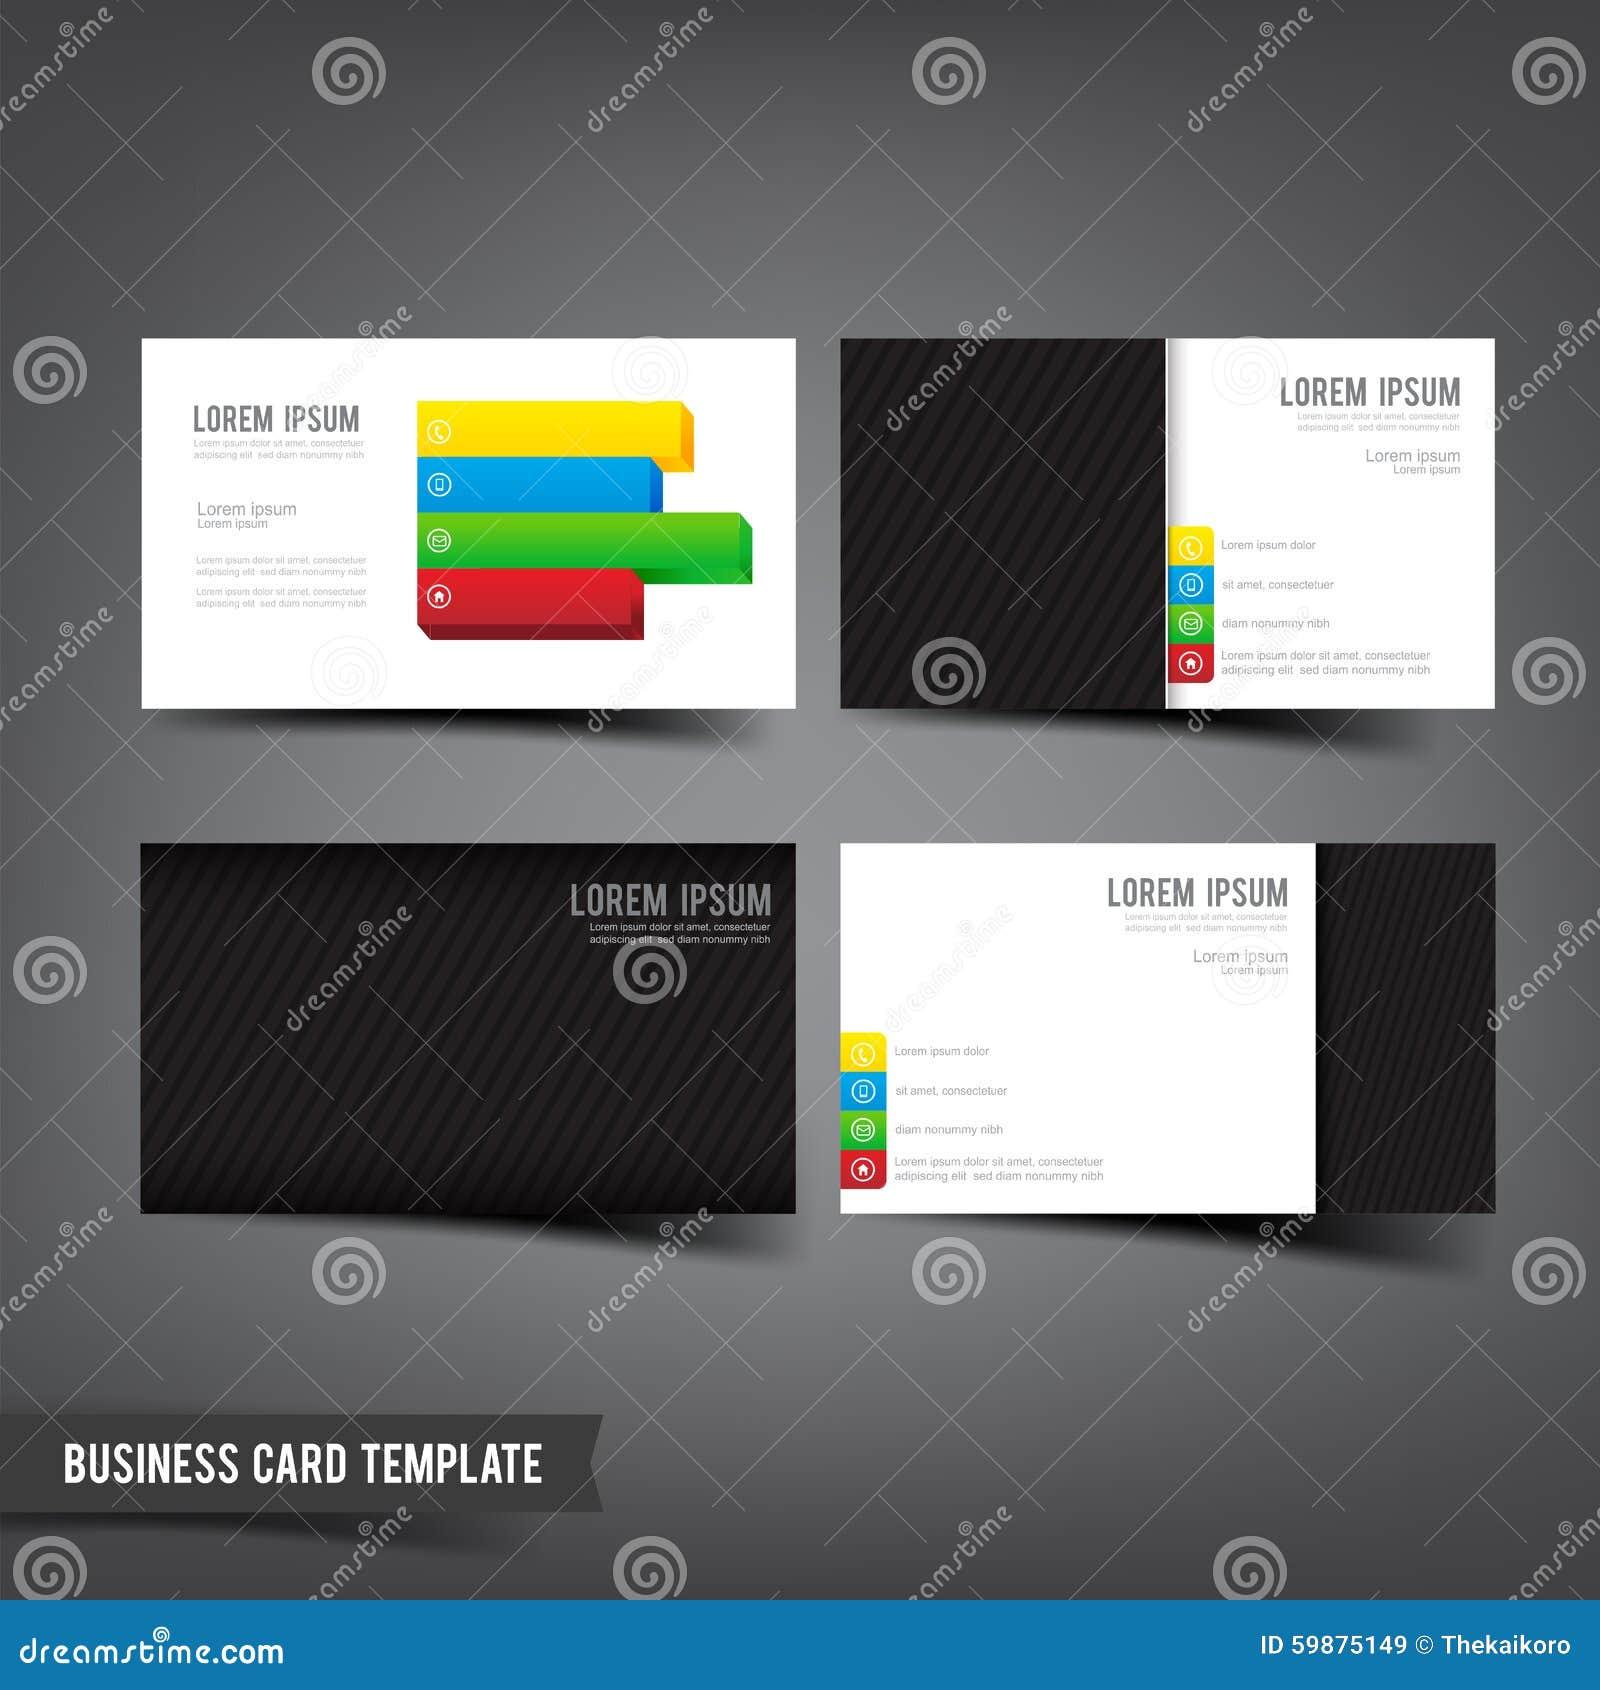 Business card template set 045 grey white color with mini four stock download business card template set 045 grey white color with mini four stock vector illustration flashek Choice Image